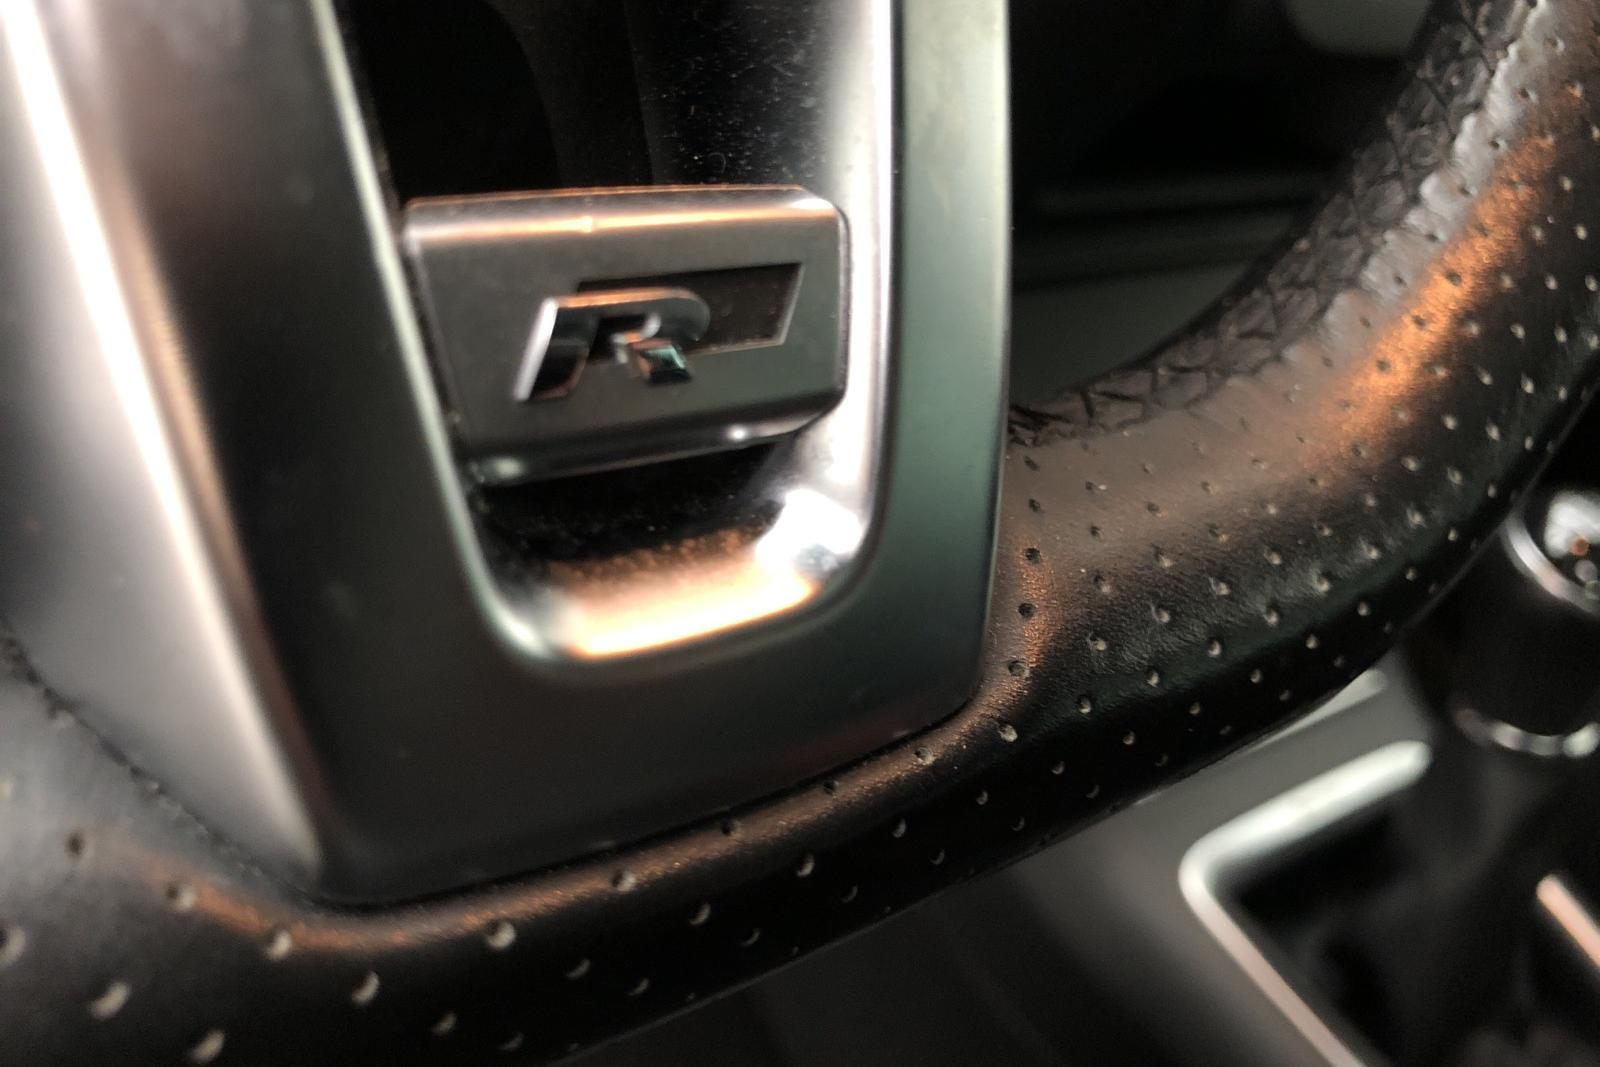 VW Tiguan 1.4 TSI 4MOTION (160hk) - 15 200 mil - Manuell - svart - 2015